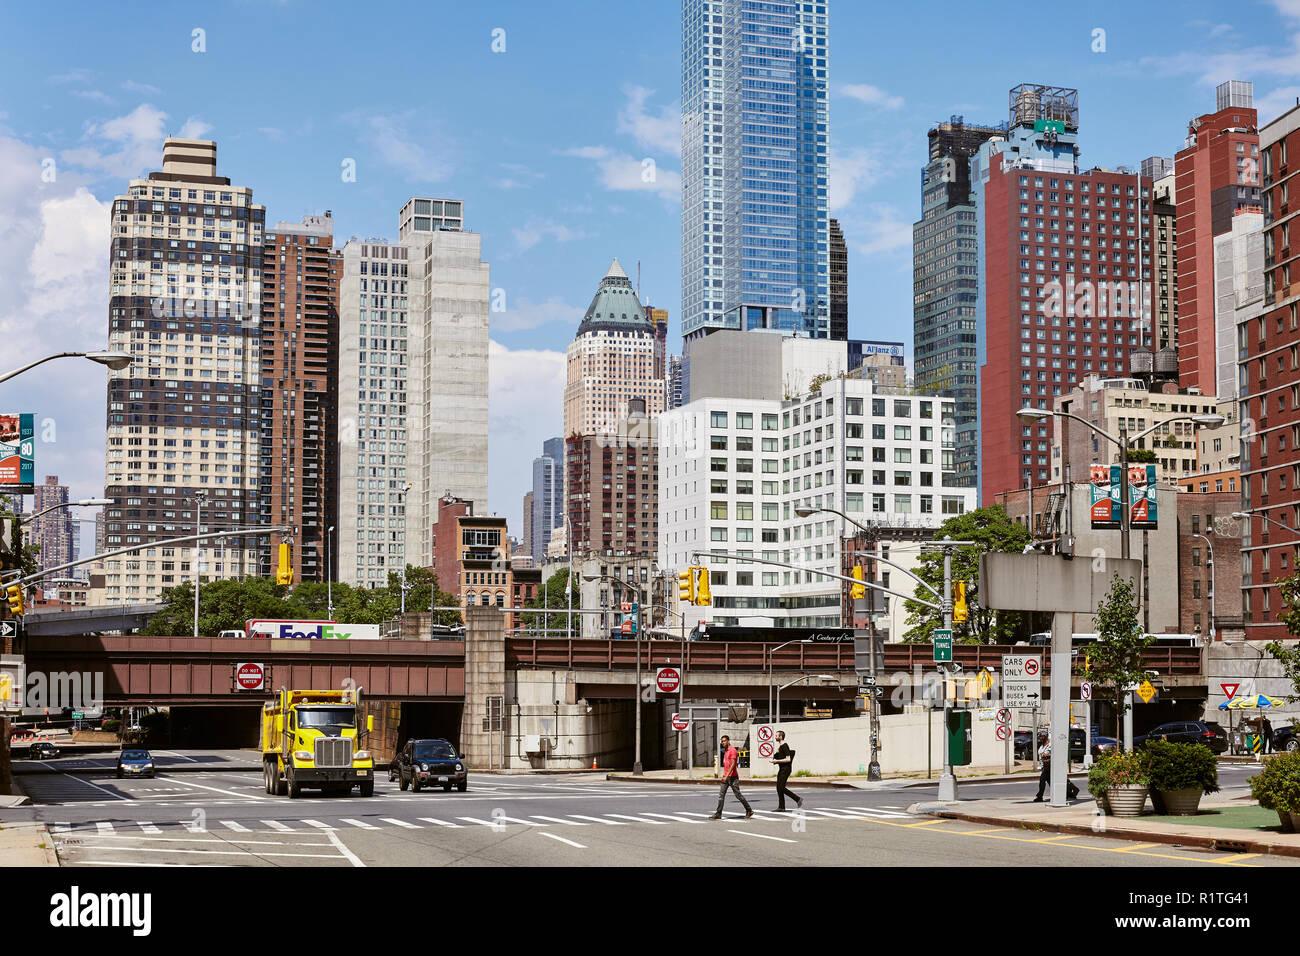 1920s New York City Immagini   1920s New York City Fotos Stock - Alamy 8f24a2d8327f